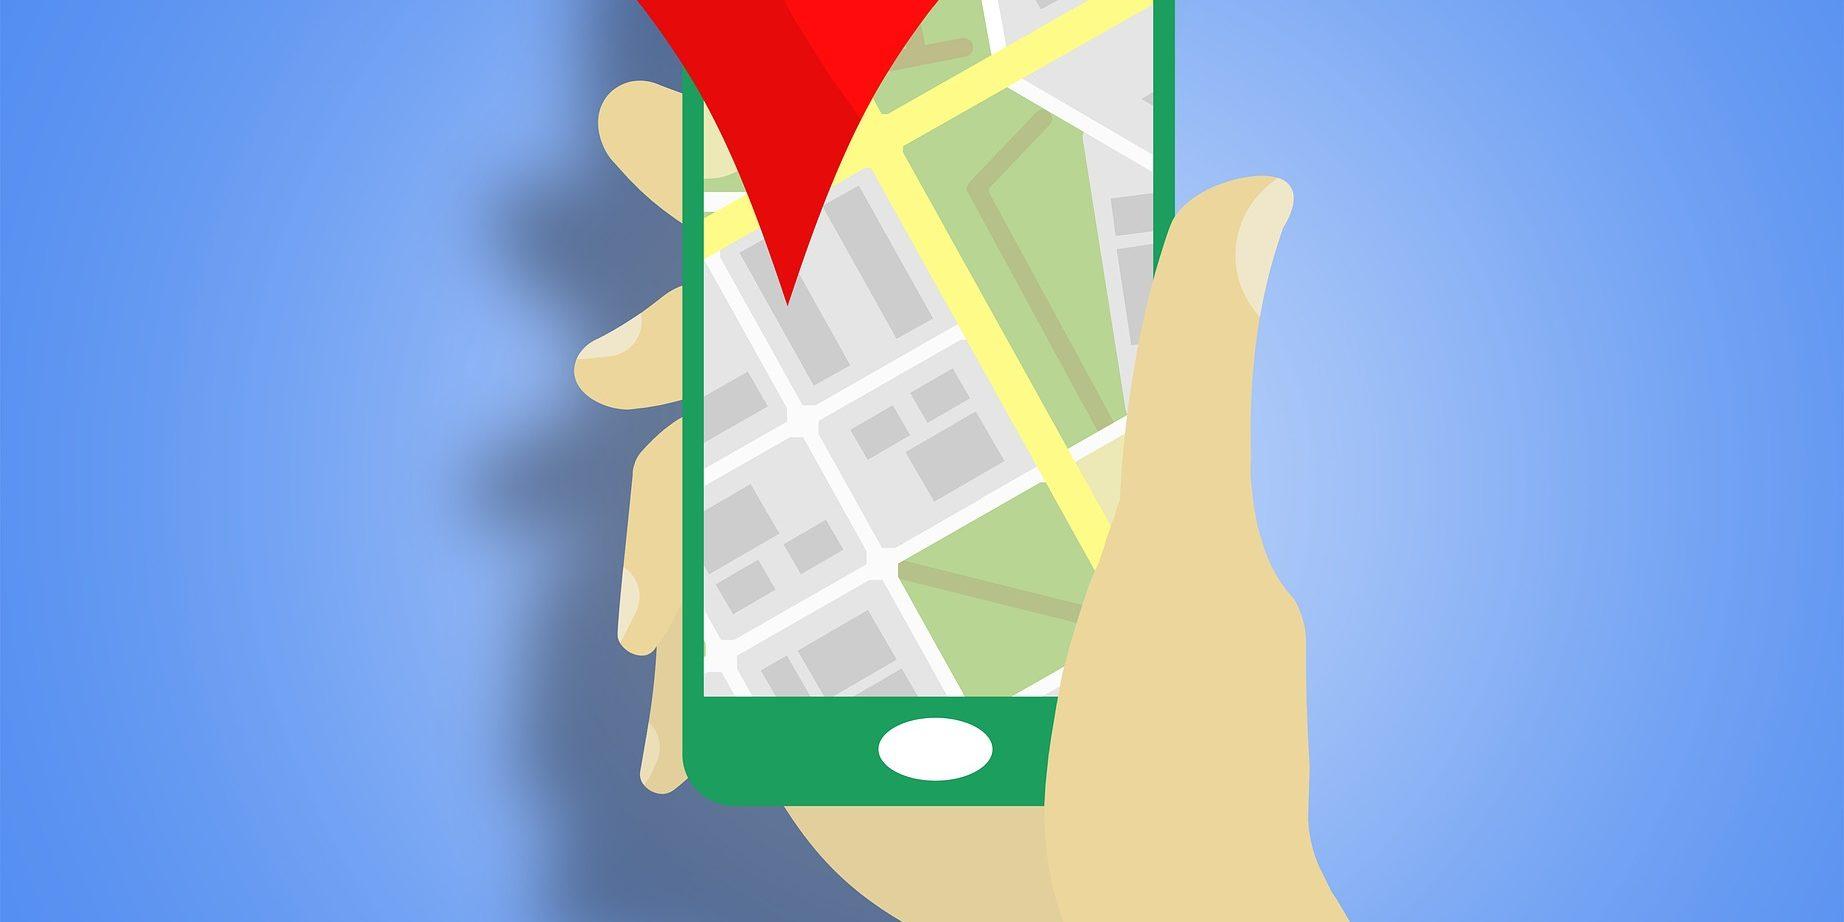 navigation-2049641_1920